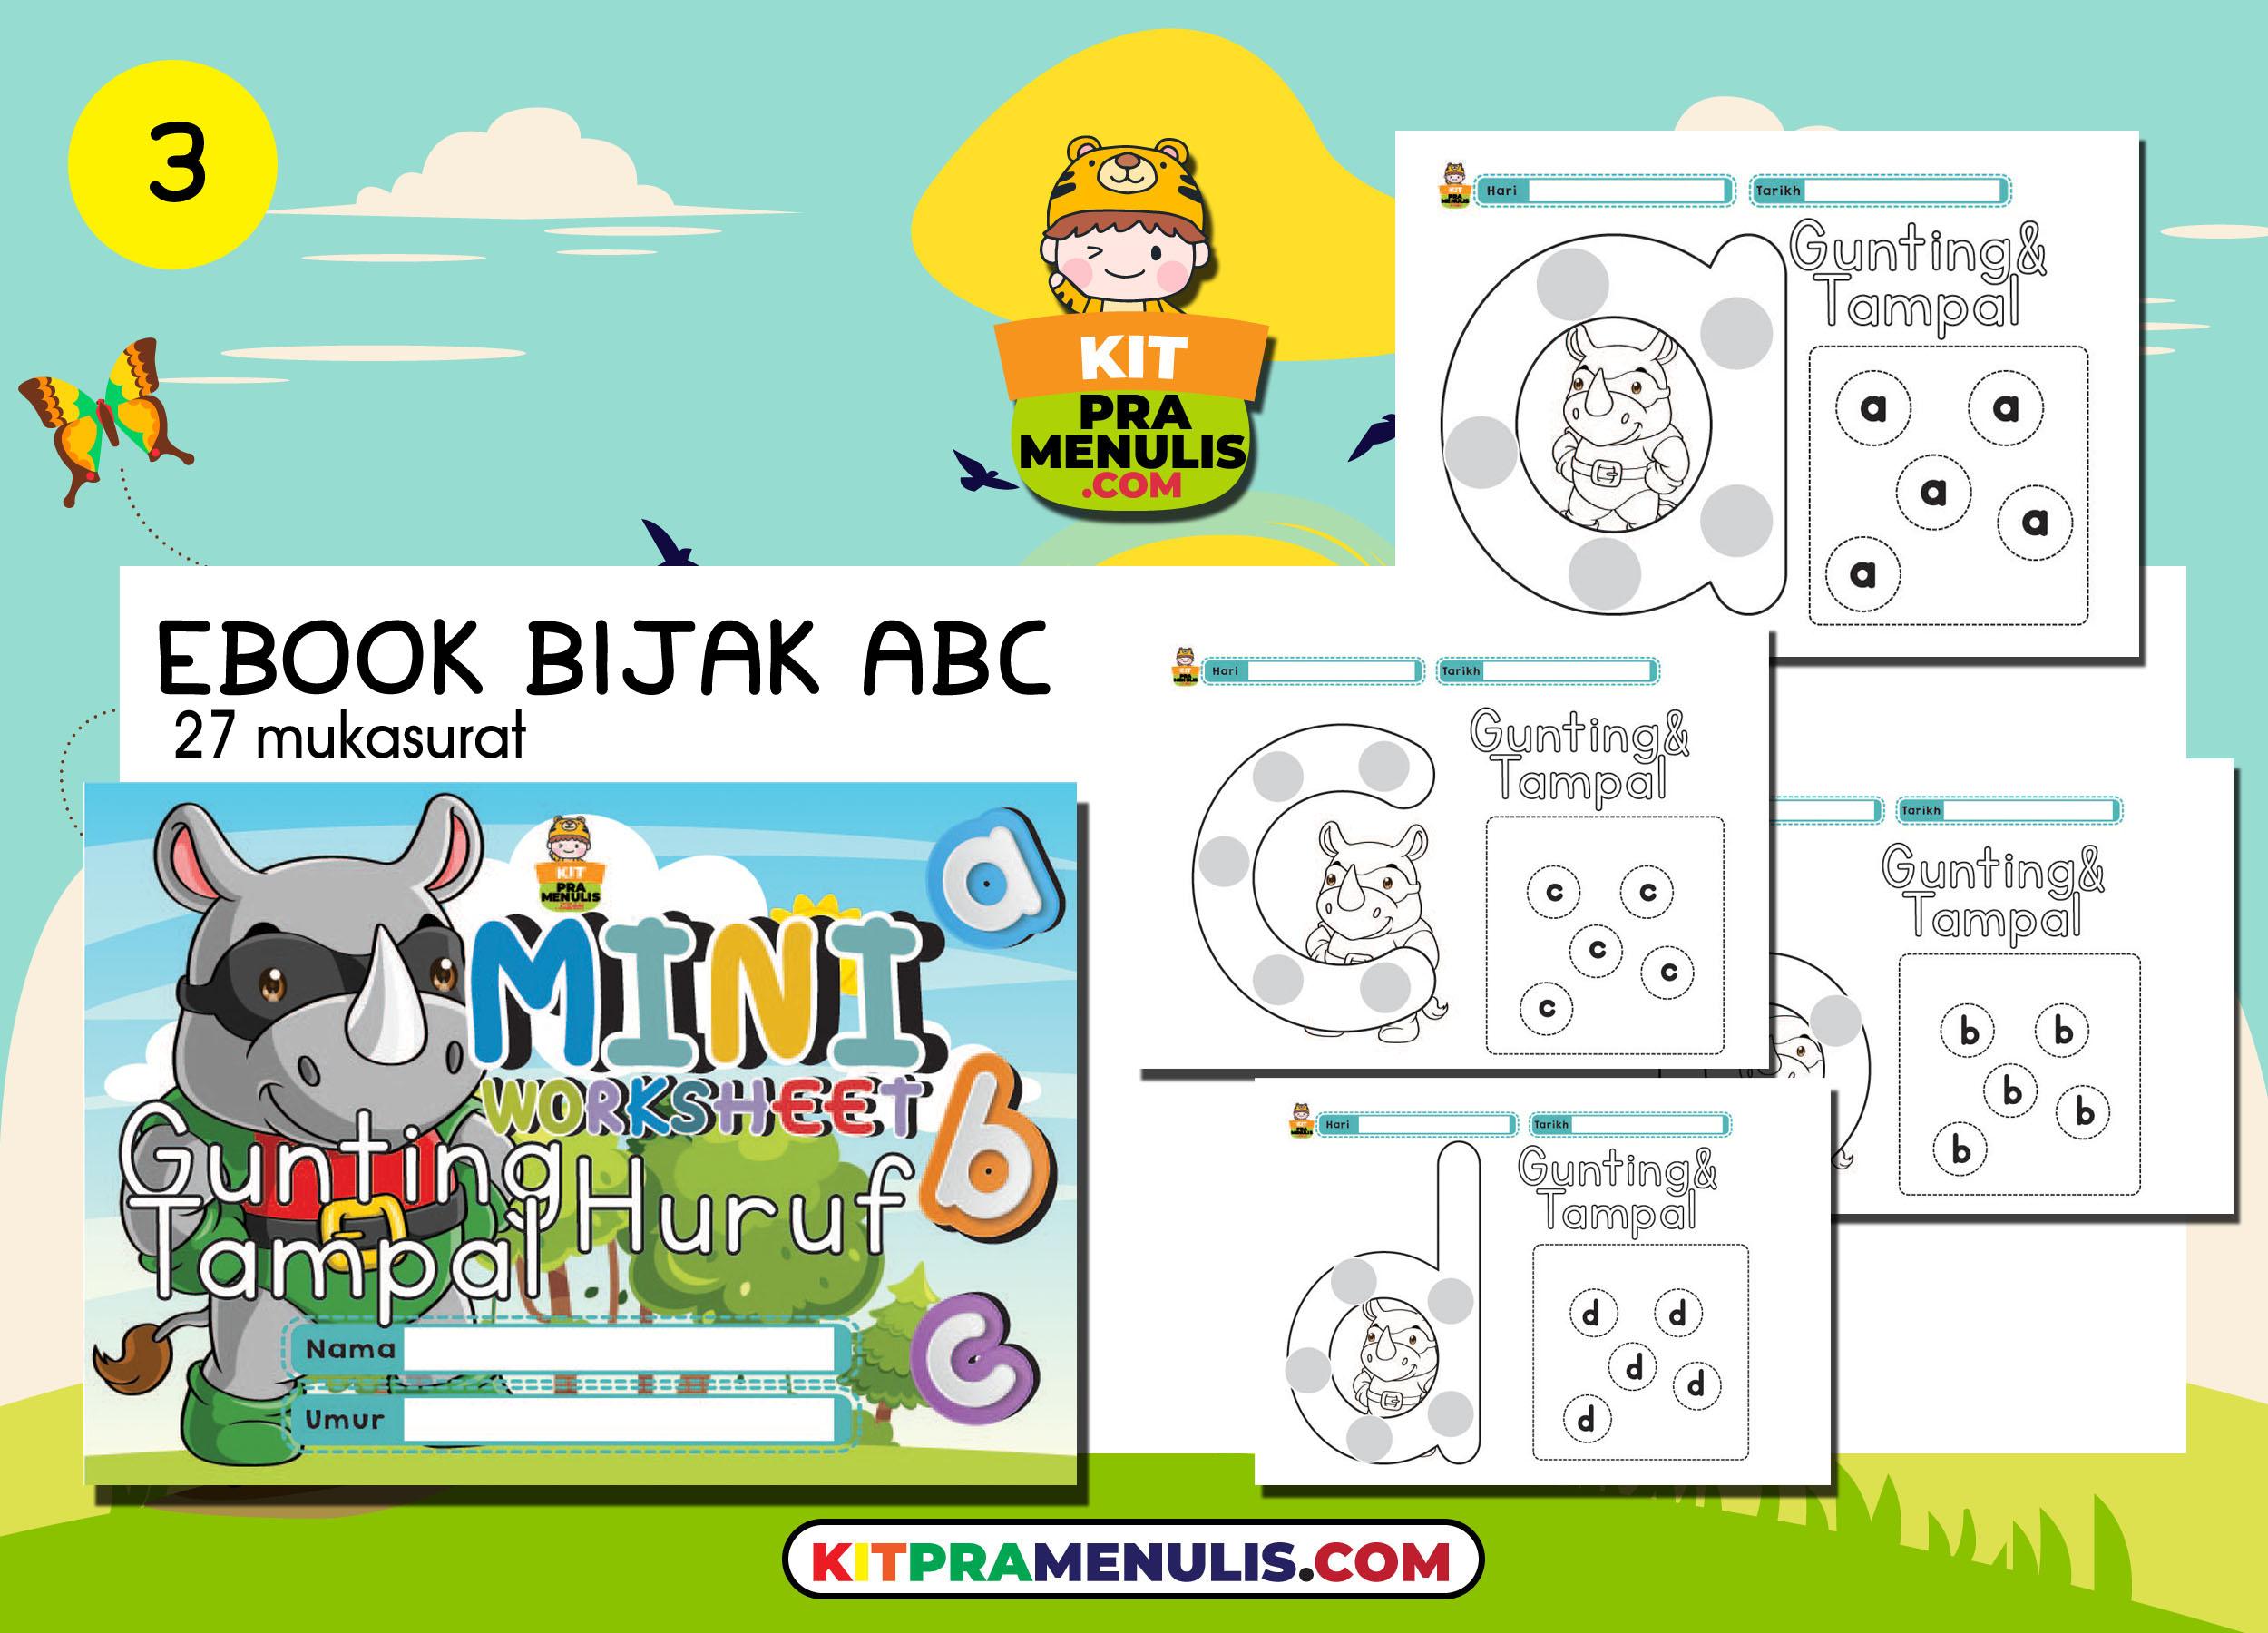 5-EBOOK-BIJAK-ABC 14 Koleksi Ebook Latihan Bijak ABC Dan Bijak Nombor 1 Hingga 10